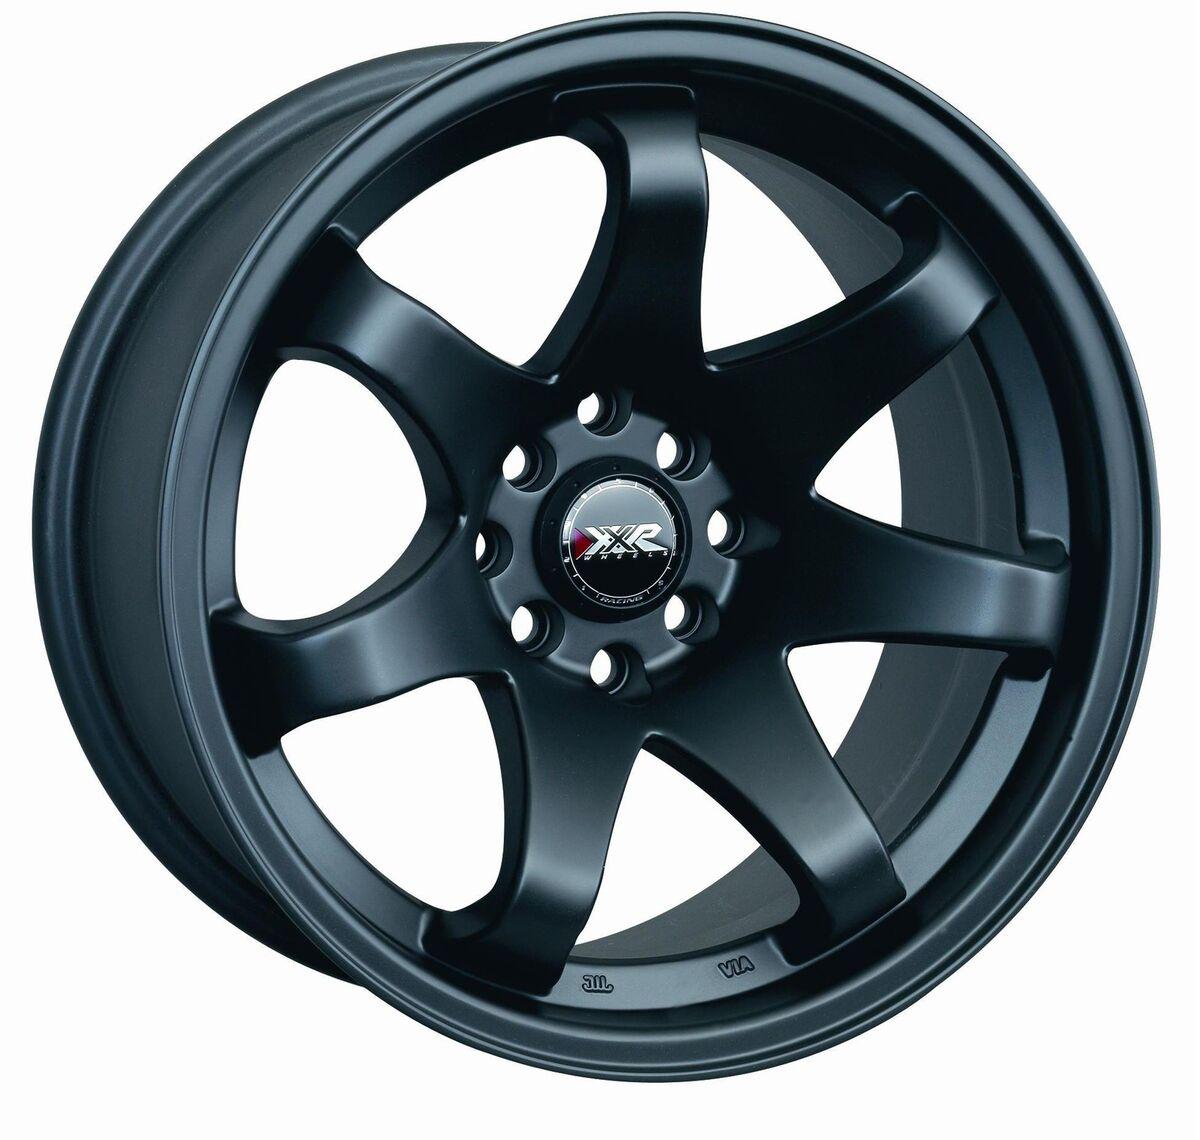 18 XXR 522 Rims Wheels Tires Subaru Impreza WRX Legacy 225 40 18 Falken 912